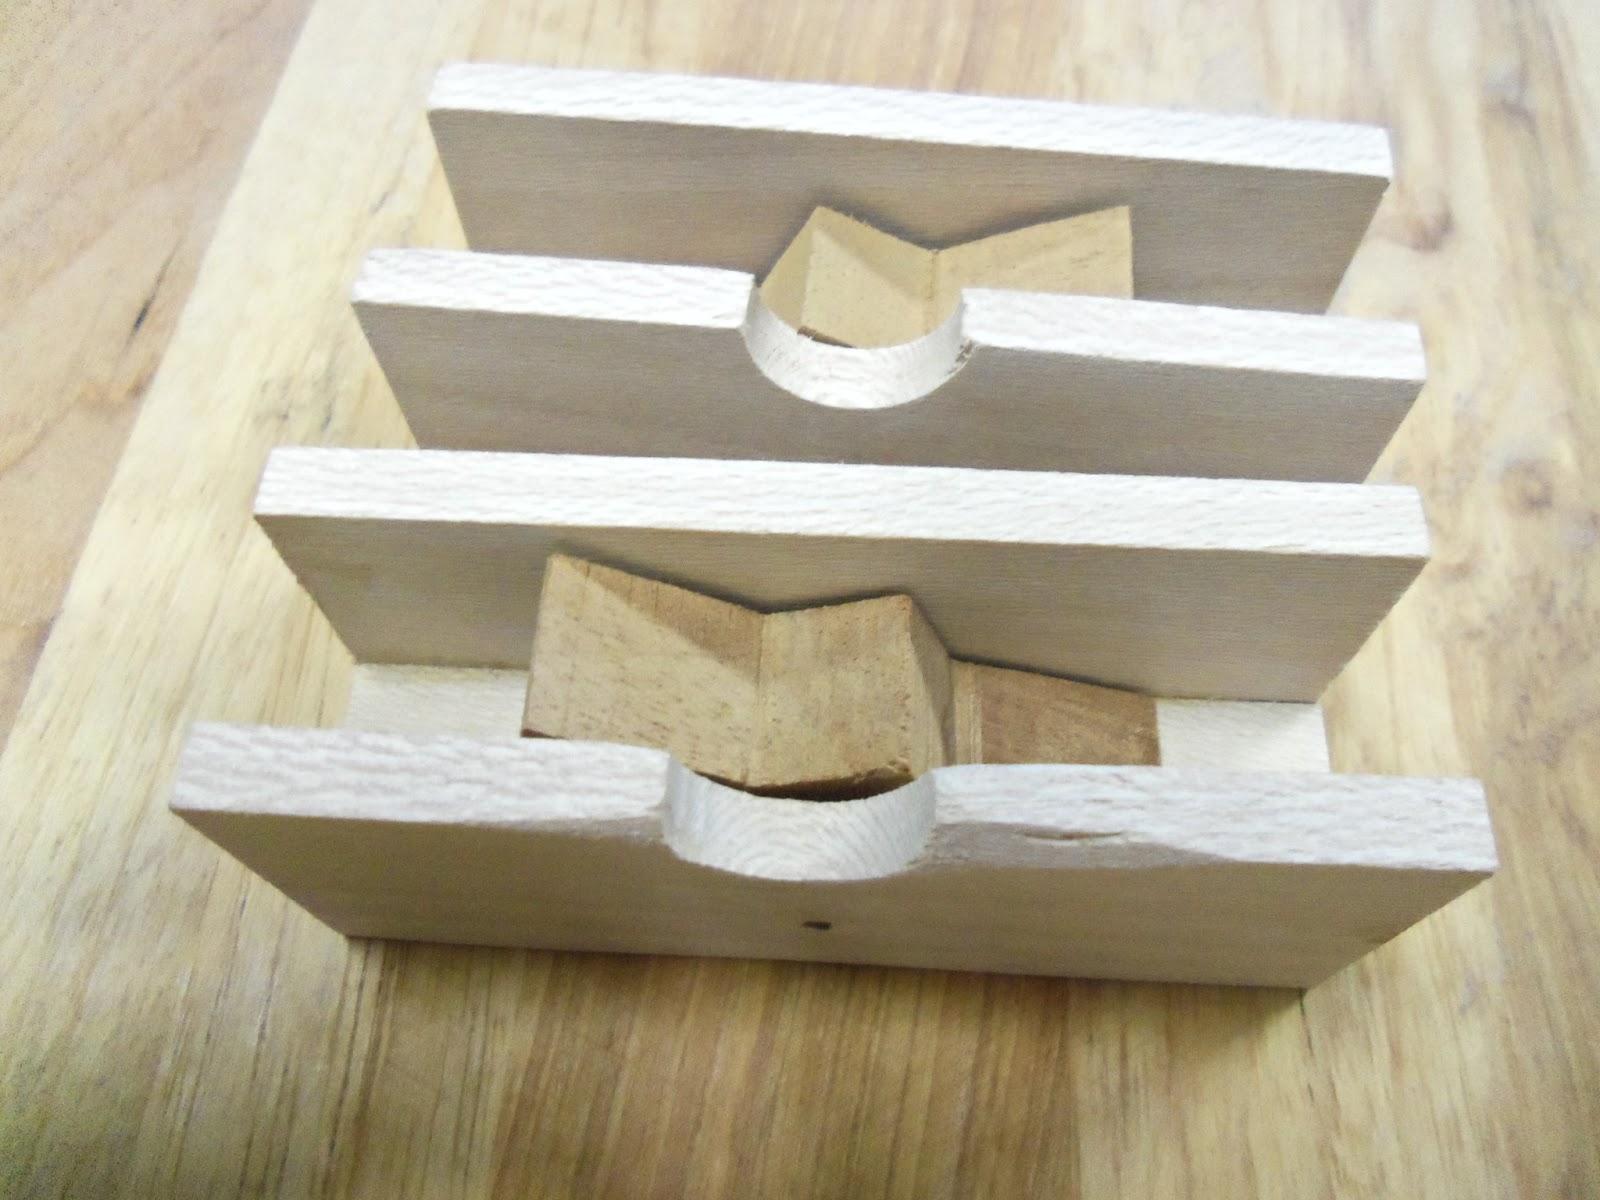 Wddsr Fine Woodworks Marble Machine Goes Modular - Track -5545